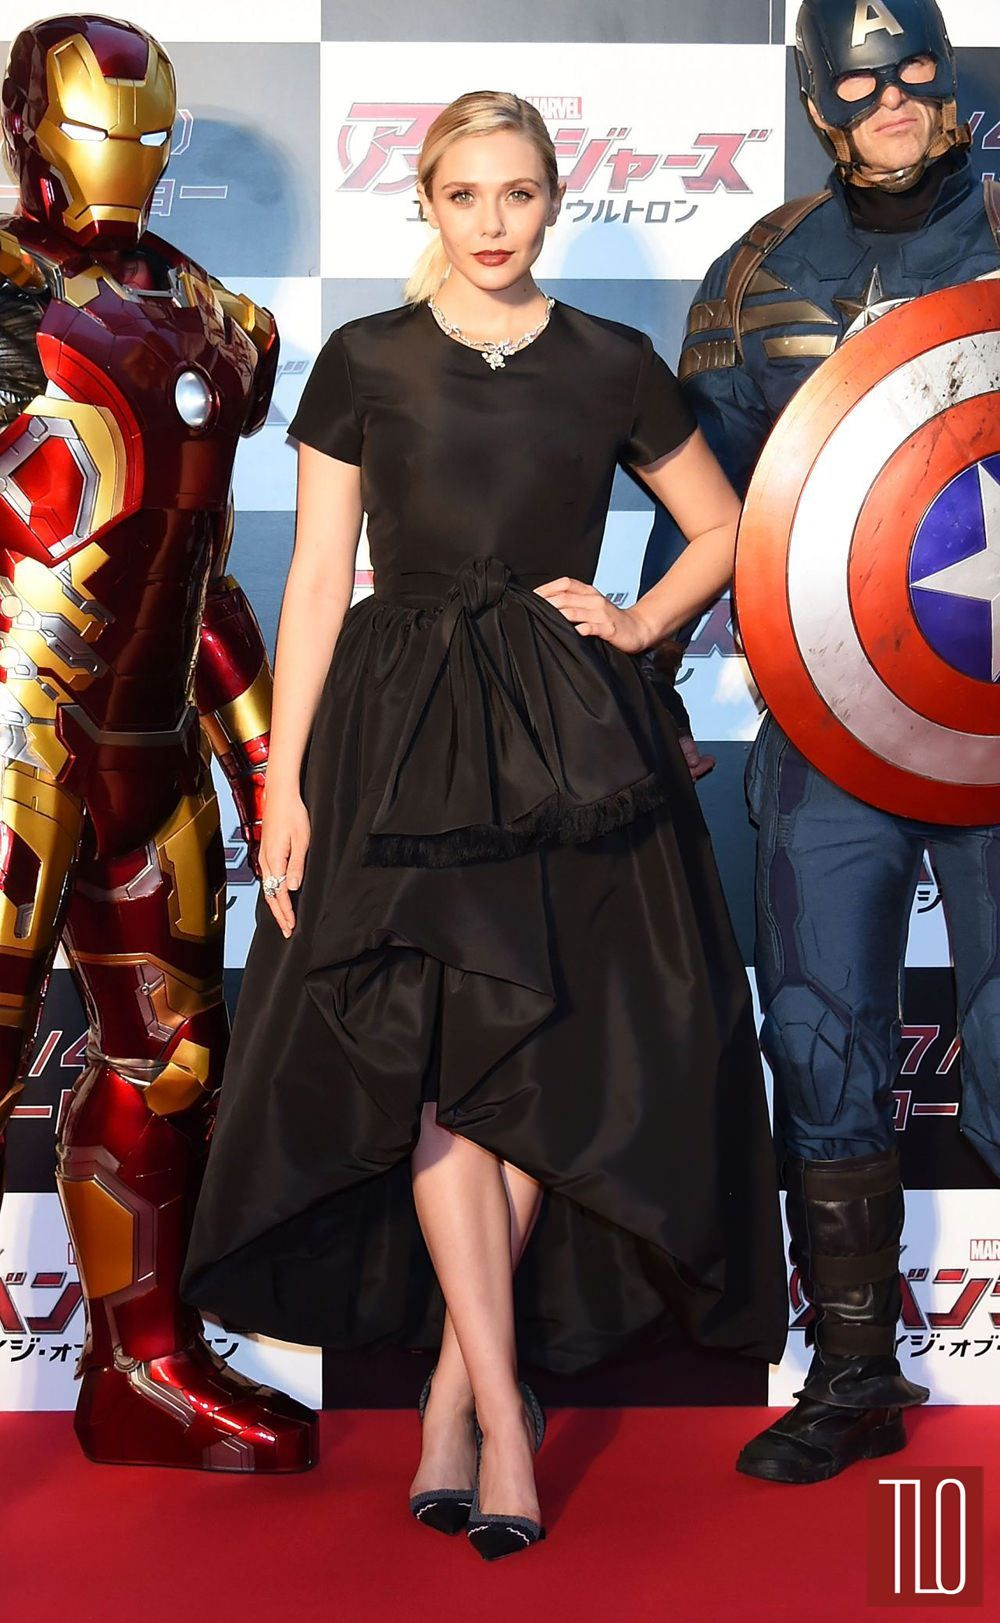 Elizabeth Olsen At The Avengers Age Of Ultron Tokyo Premiere Tom Lorenzo Fabulous Opinionated Elizabeth Olsen Style Elizabeth Olsen Celebrity Dresses